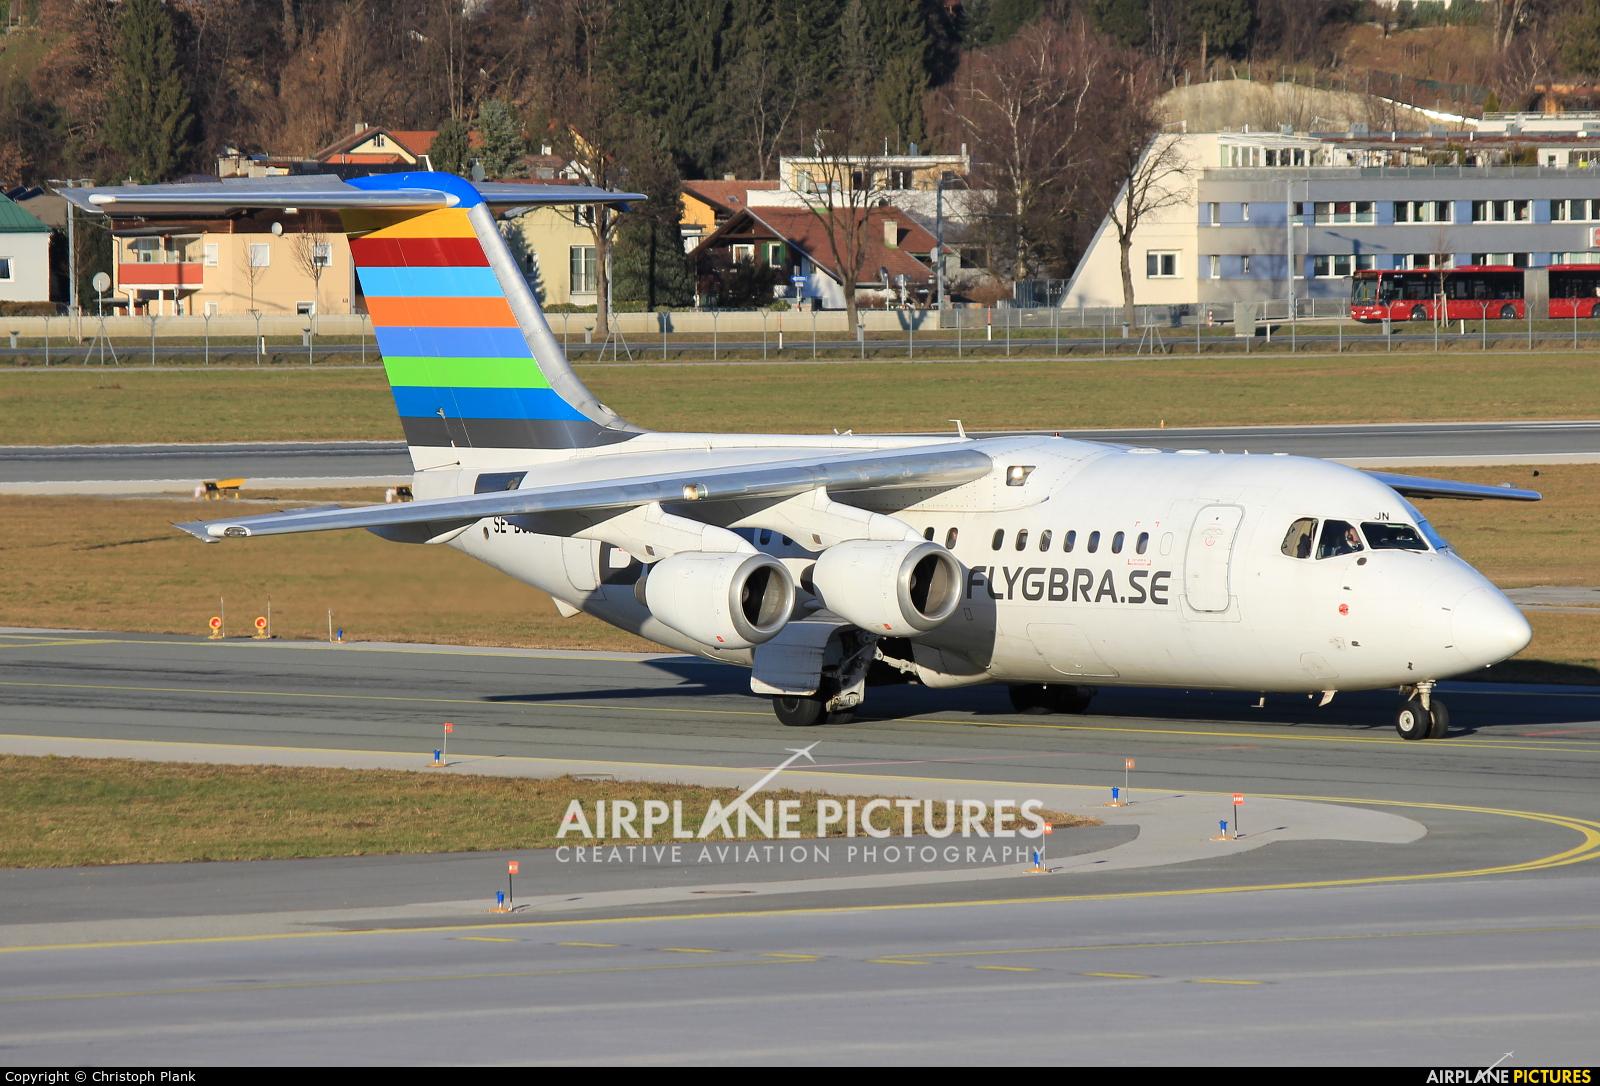 BRA (Sweden) SE-DJN aircraft at Innsbruck